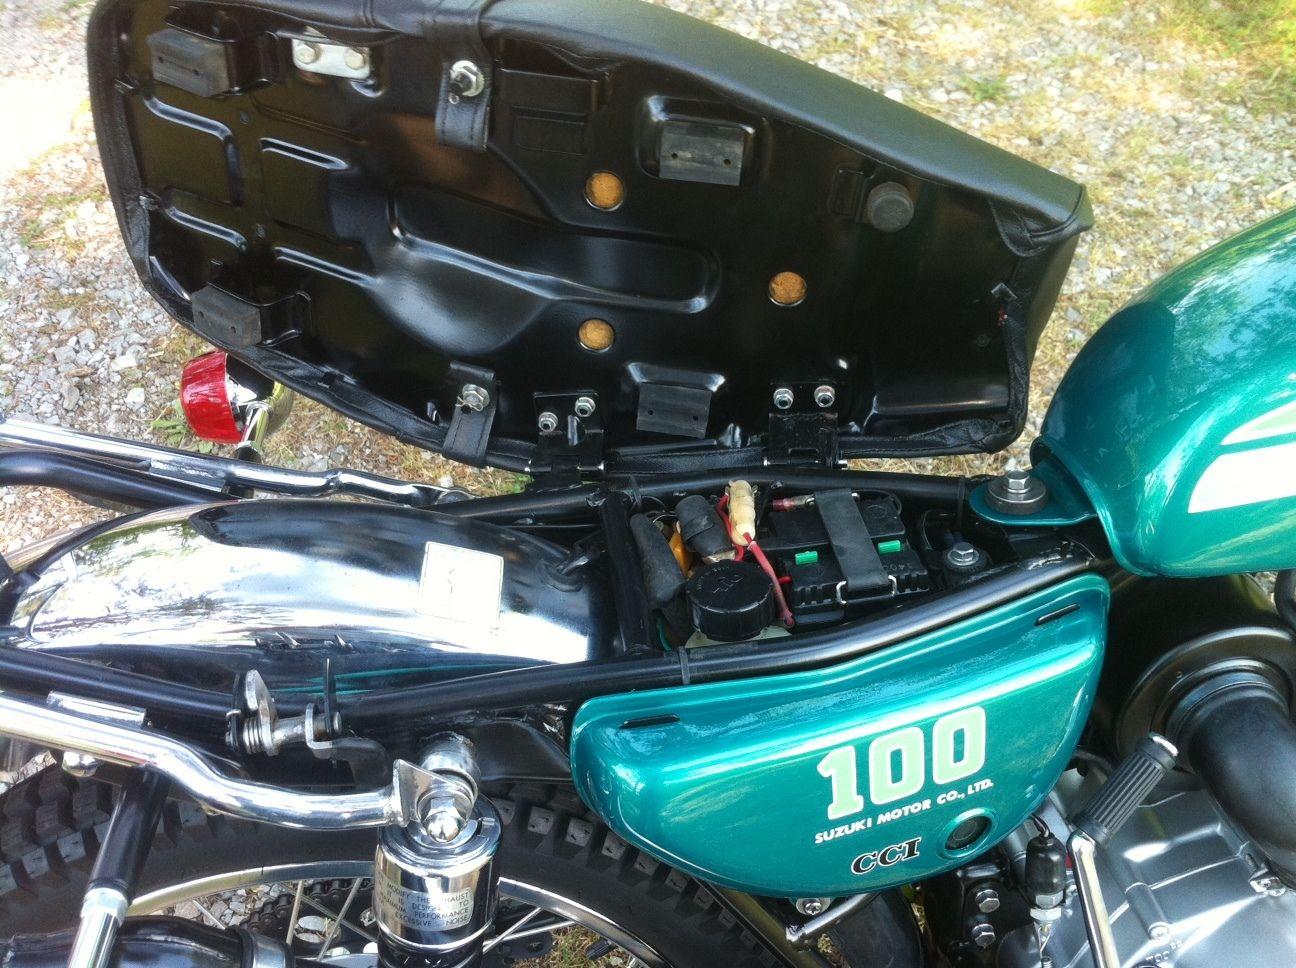 ... manual elzplorers de Array - restored suzuki tc100 1974 photographs at  classic bikes restored rh bikesrestored com